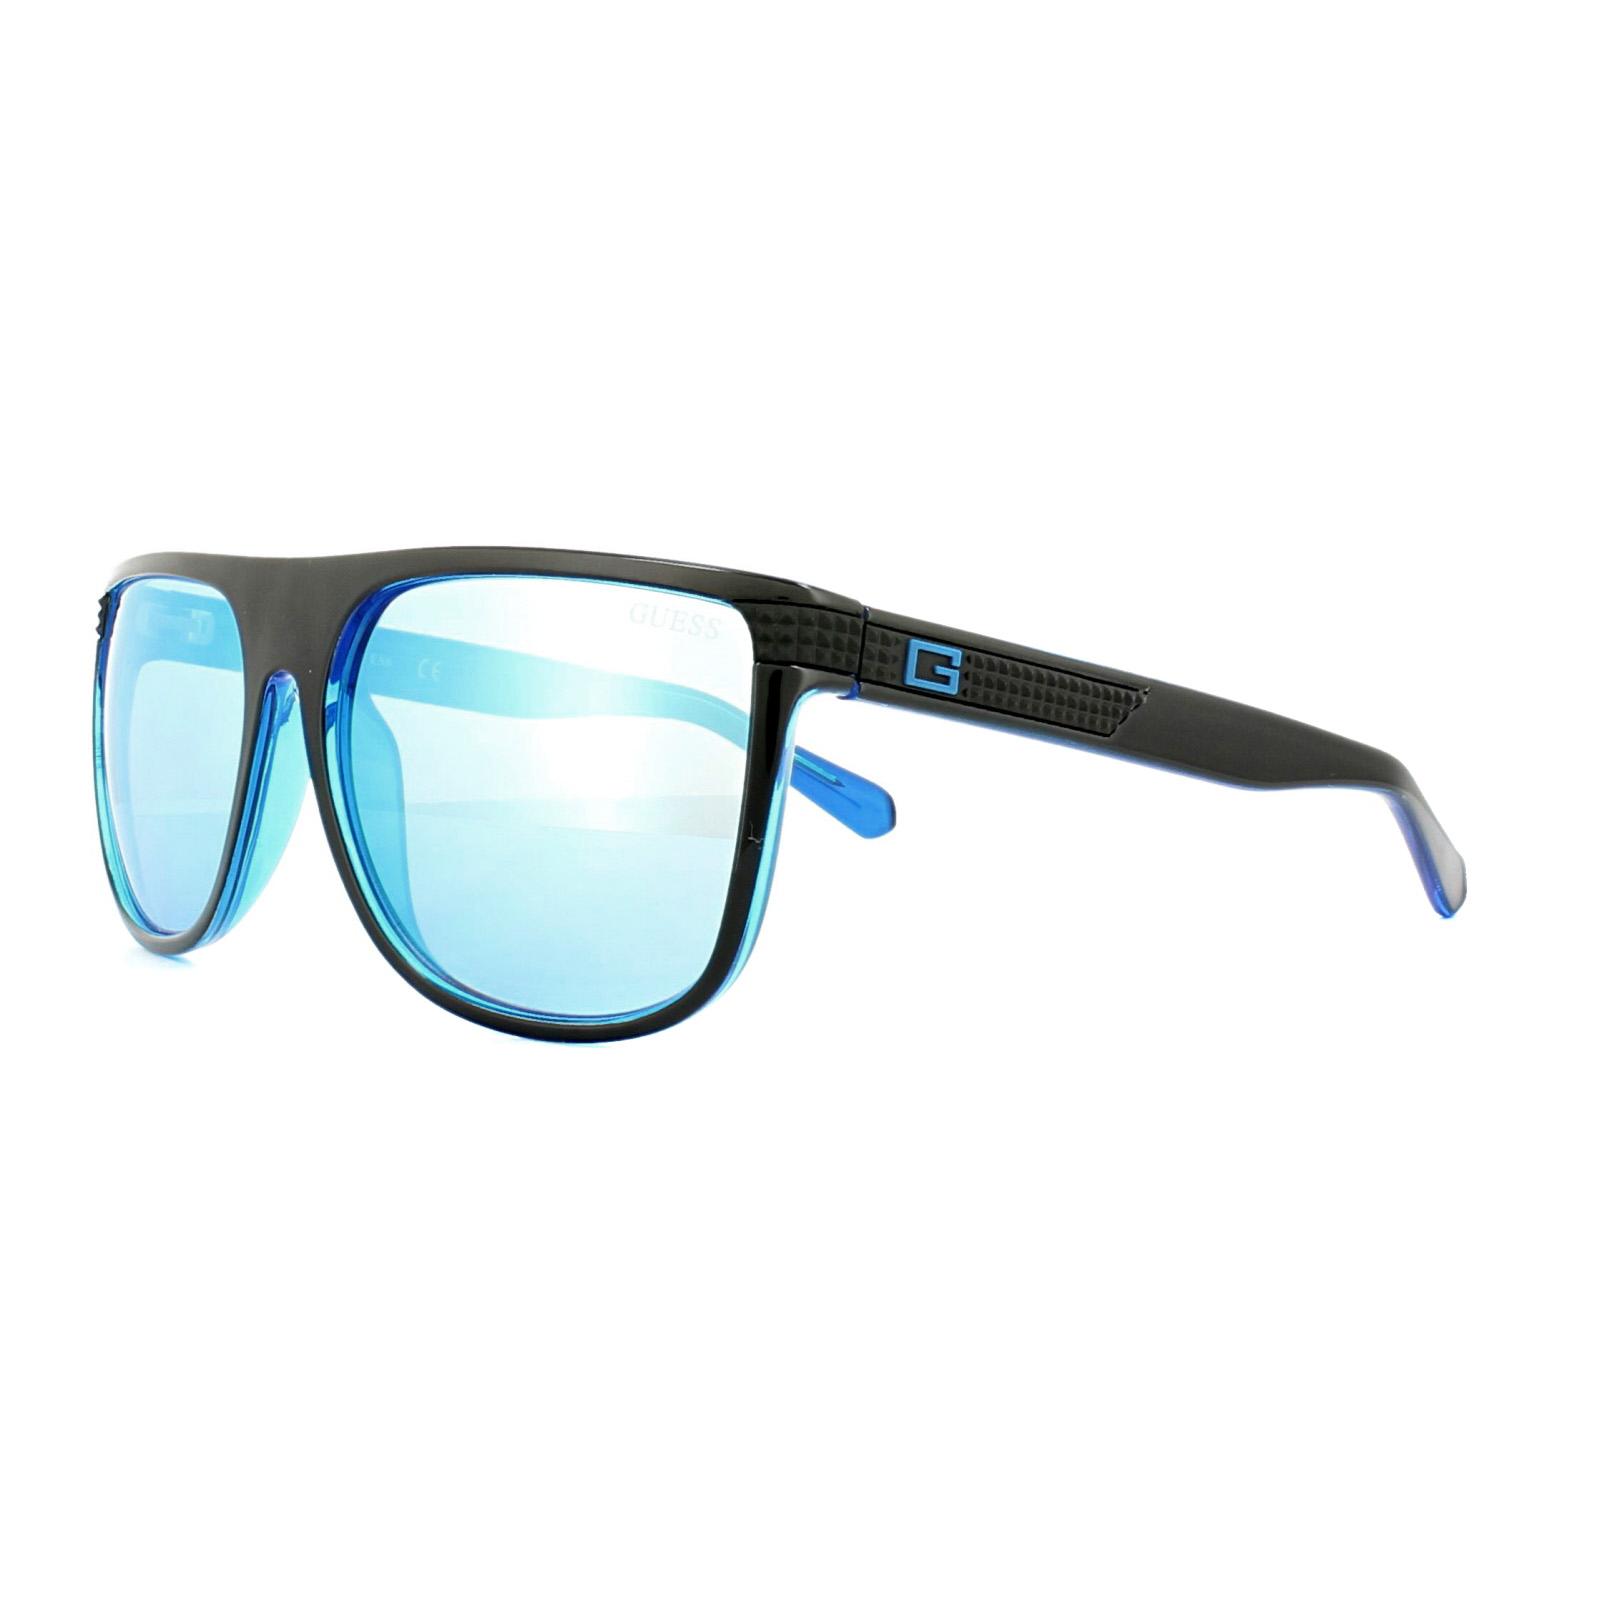 907131802d1 Cheap Guess GU6837 Sunglasses - Discounted Sunglasses